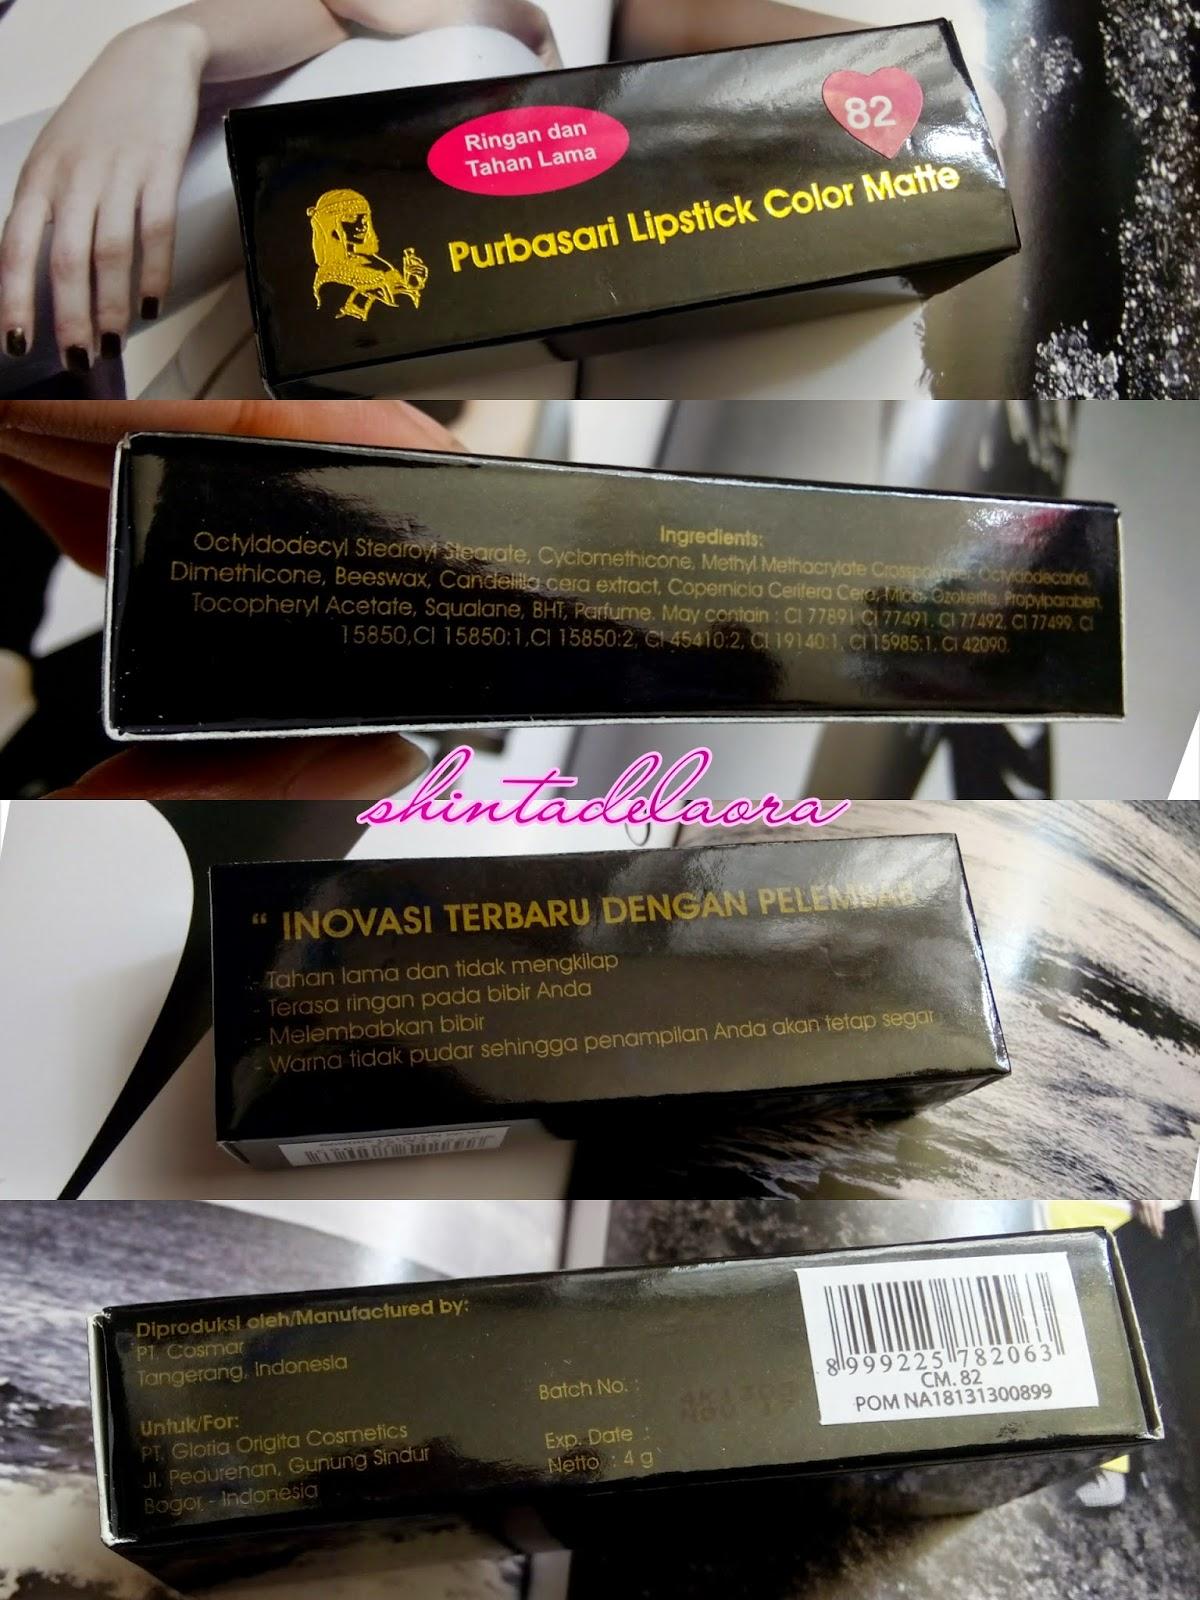 Shinta Laura Dewanis Room Superlate Review Purbasari Lipstick Lipstik Collor Matte Click To Enlarge